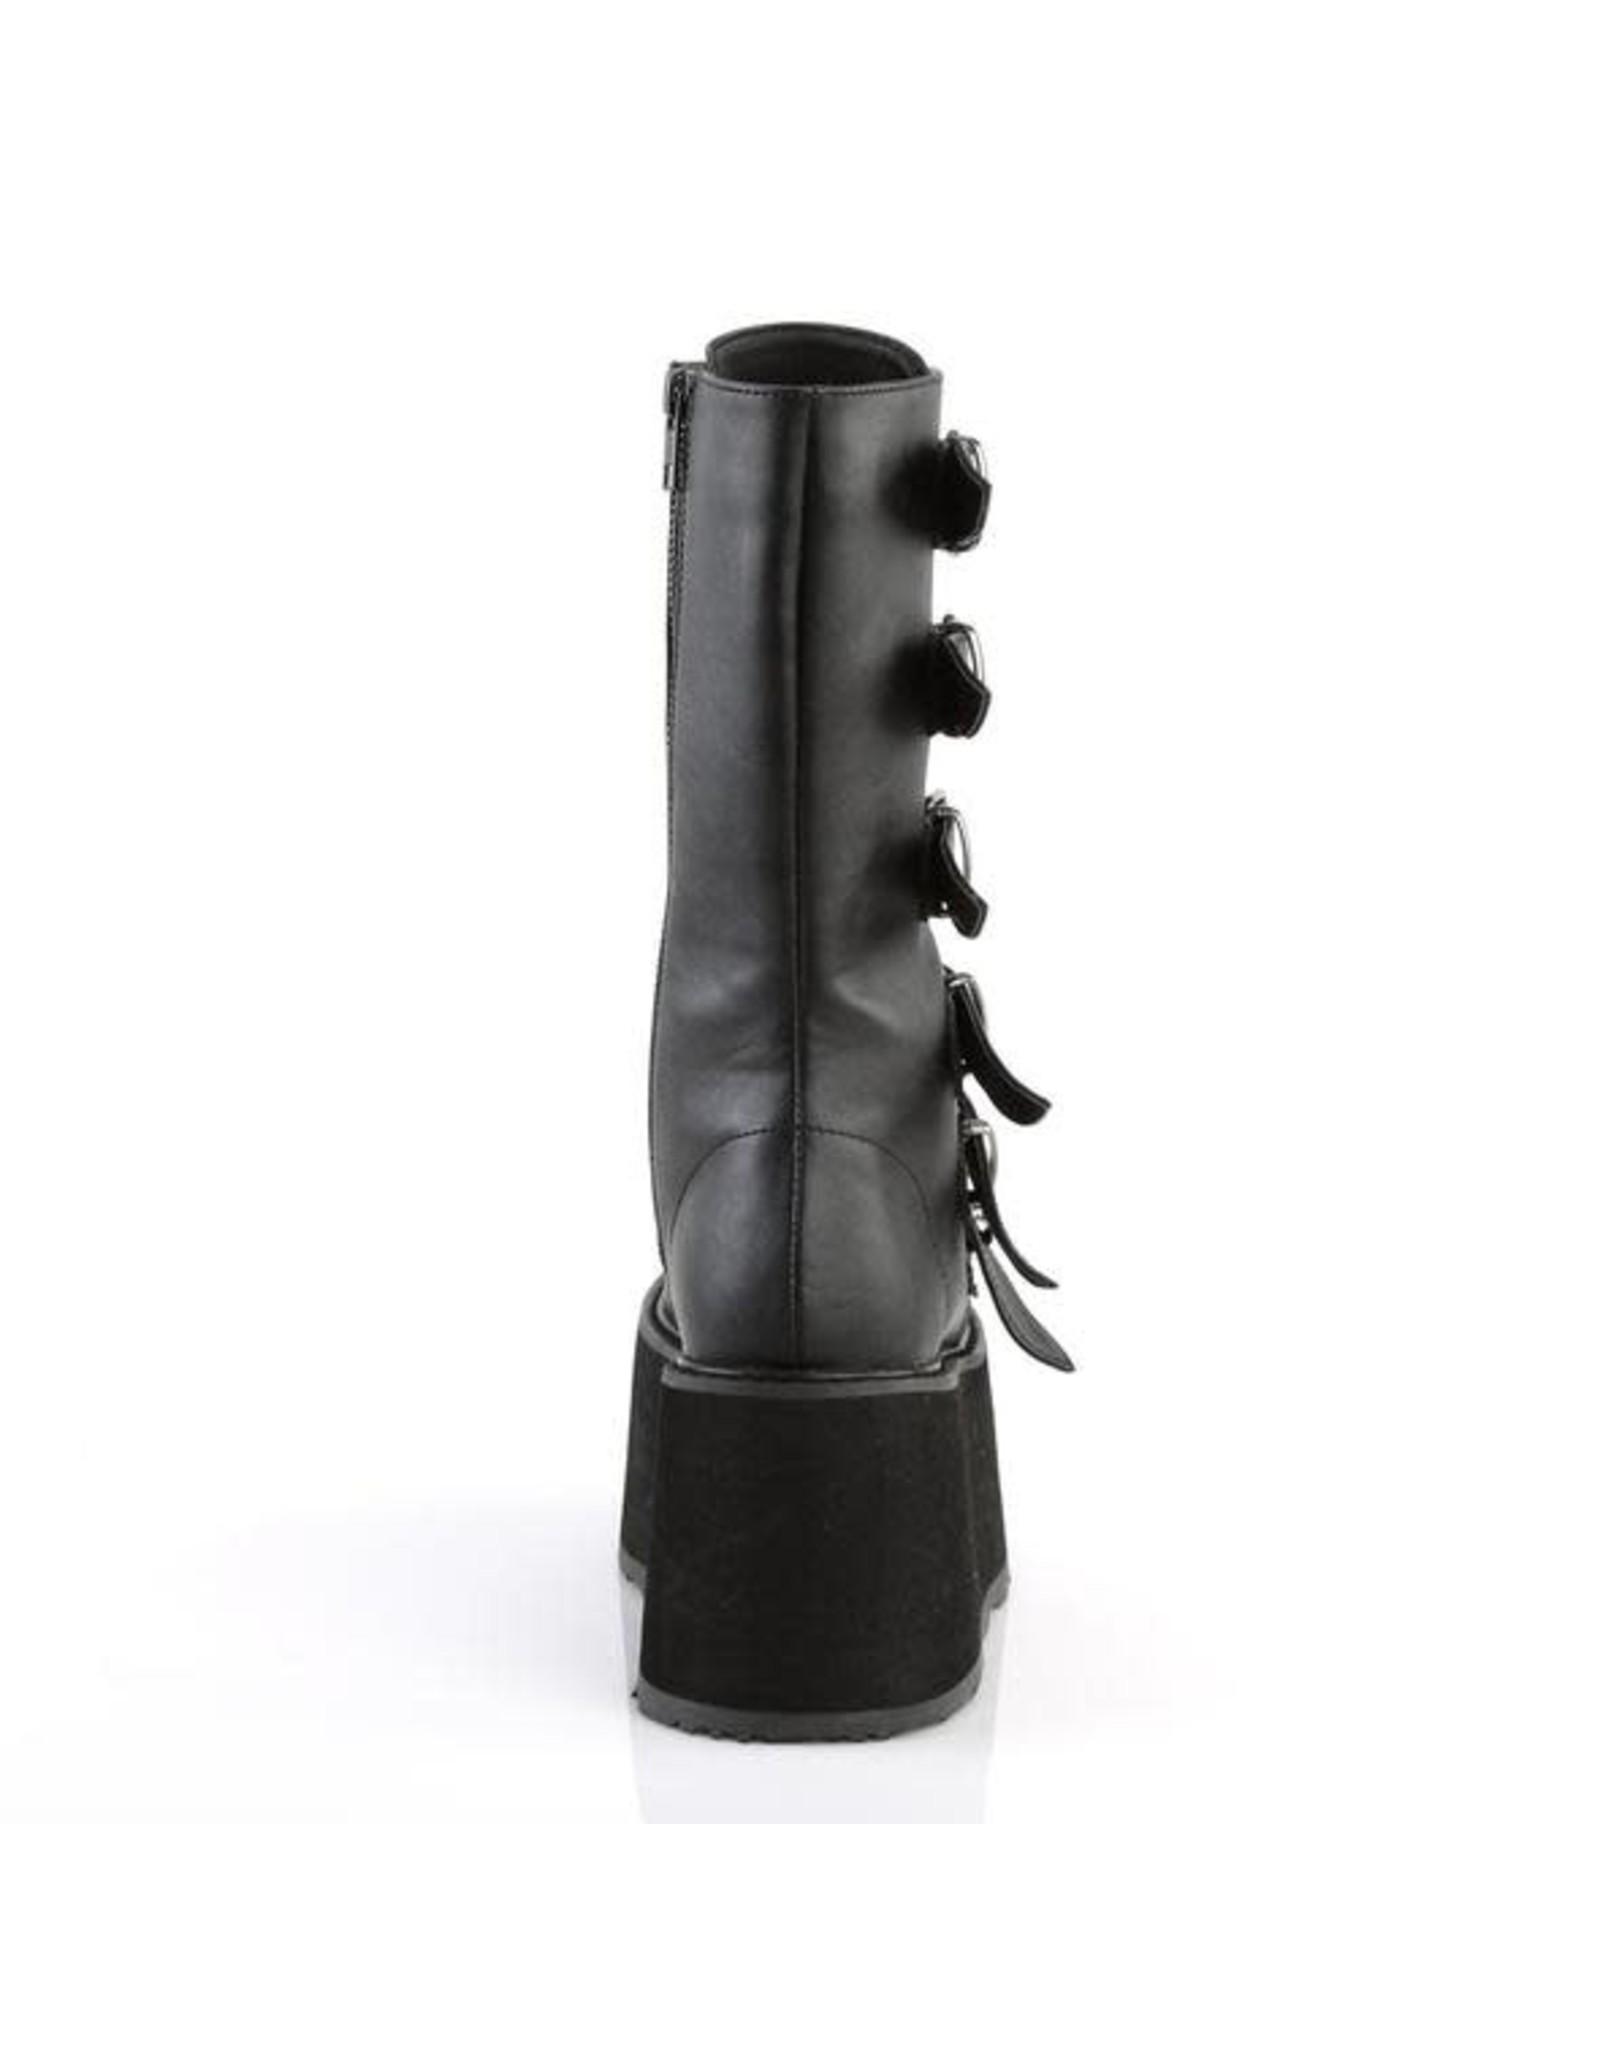 "DEMONIA DAMNED-225 3 1/2"" Platform Black Vegan Leather Boot, 6 Cone-Studded Buckle Straps, Inside Metal Zip Closure D24VB"